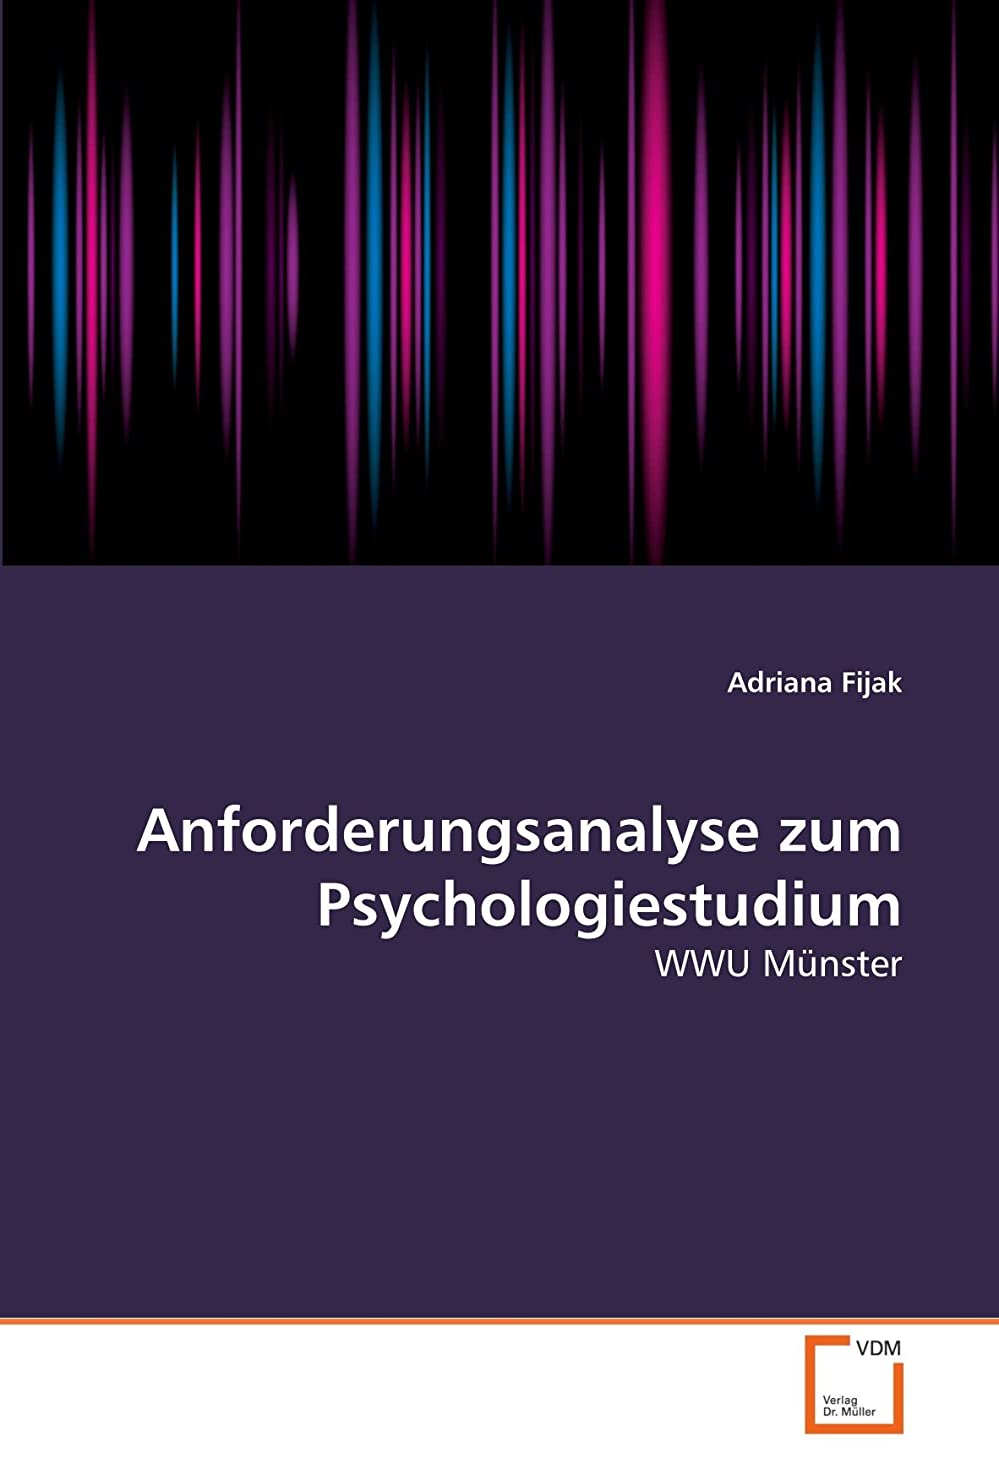 間接的抵抗相対サイズAnforderungsanalyse zum Psychologiestudium: WWU Muenster